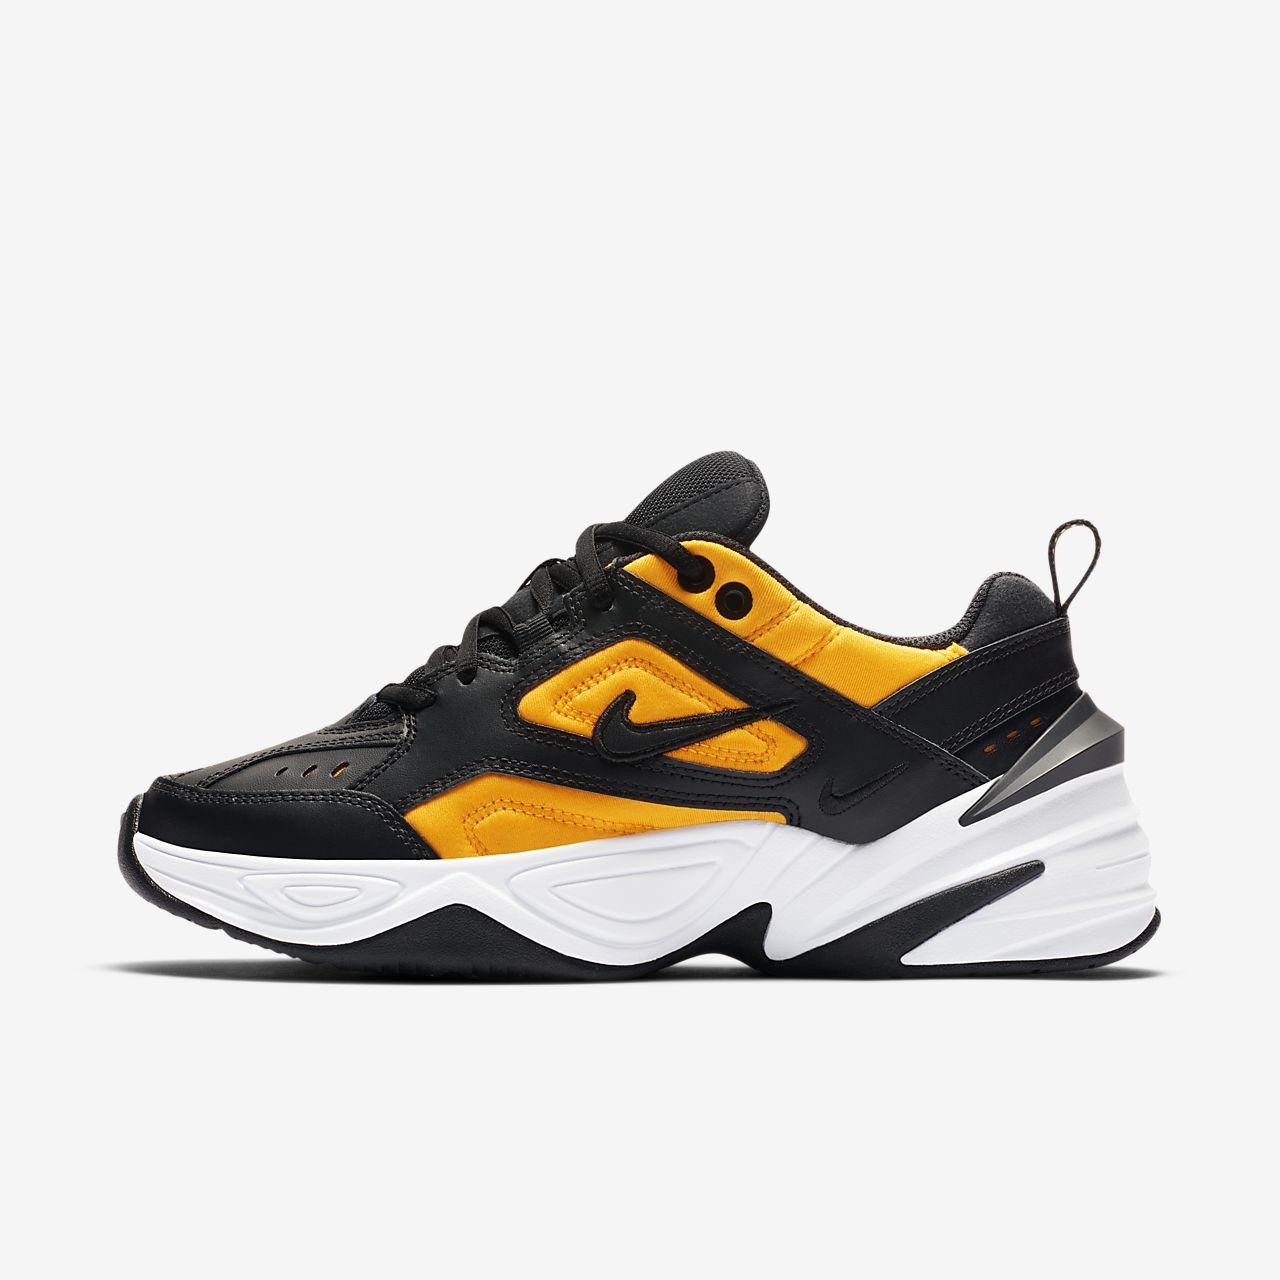 low priced c0b46 48116 Nike M2K Tekno Shoe. Nike.com AU